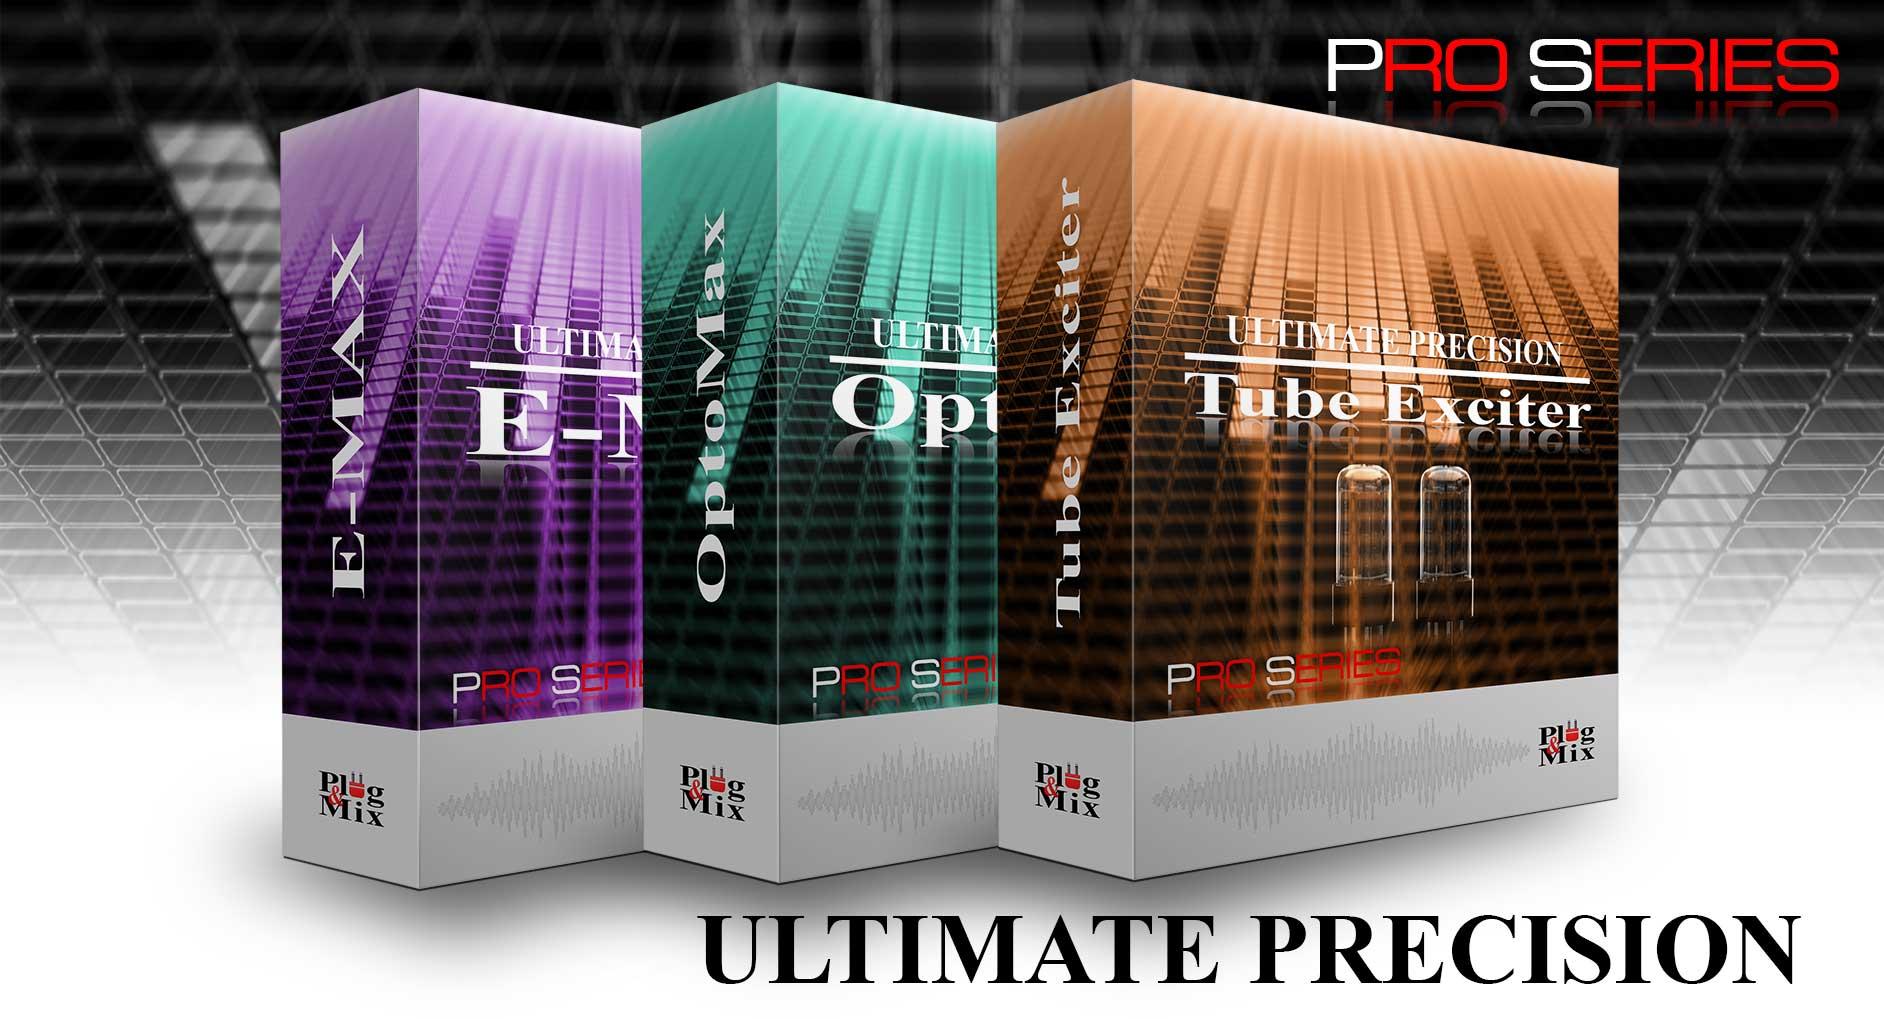 P&M Pro Series Pack